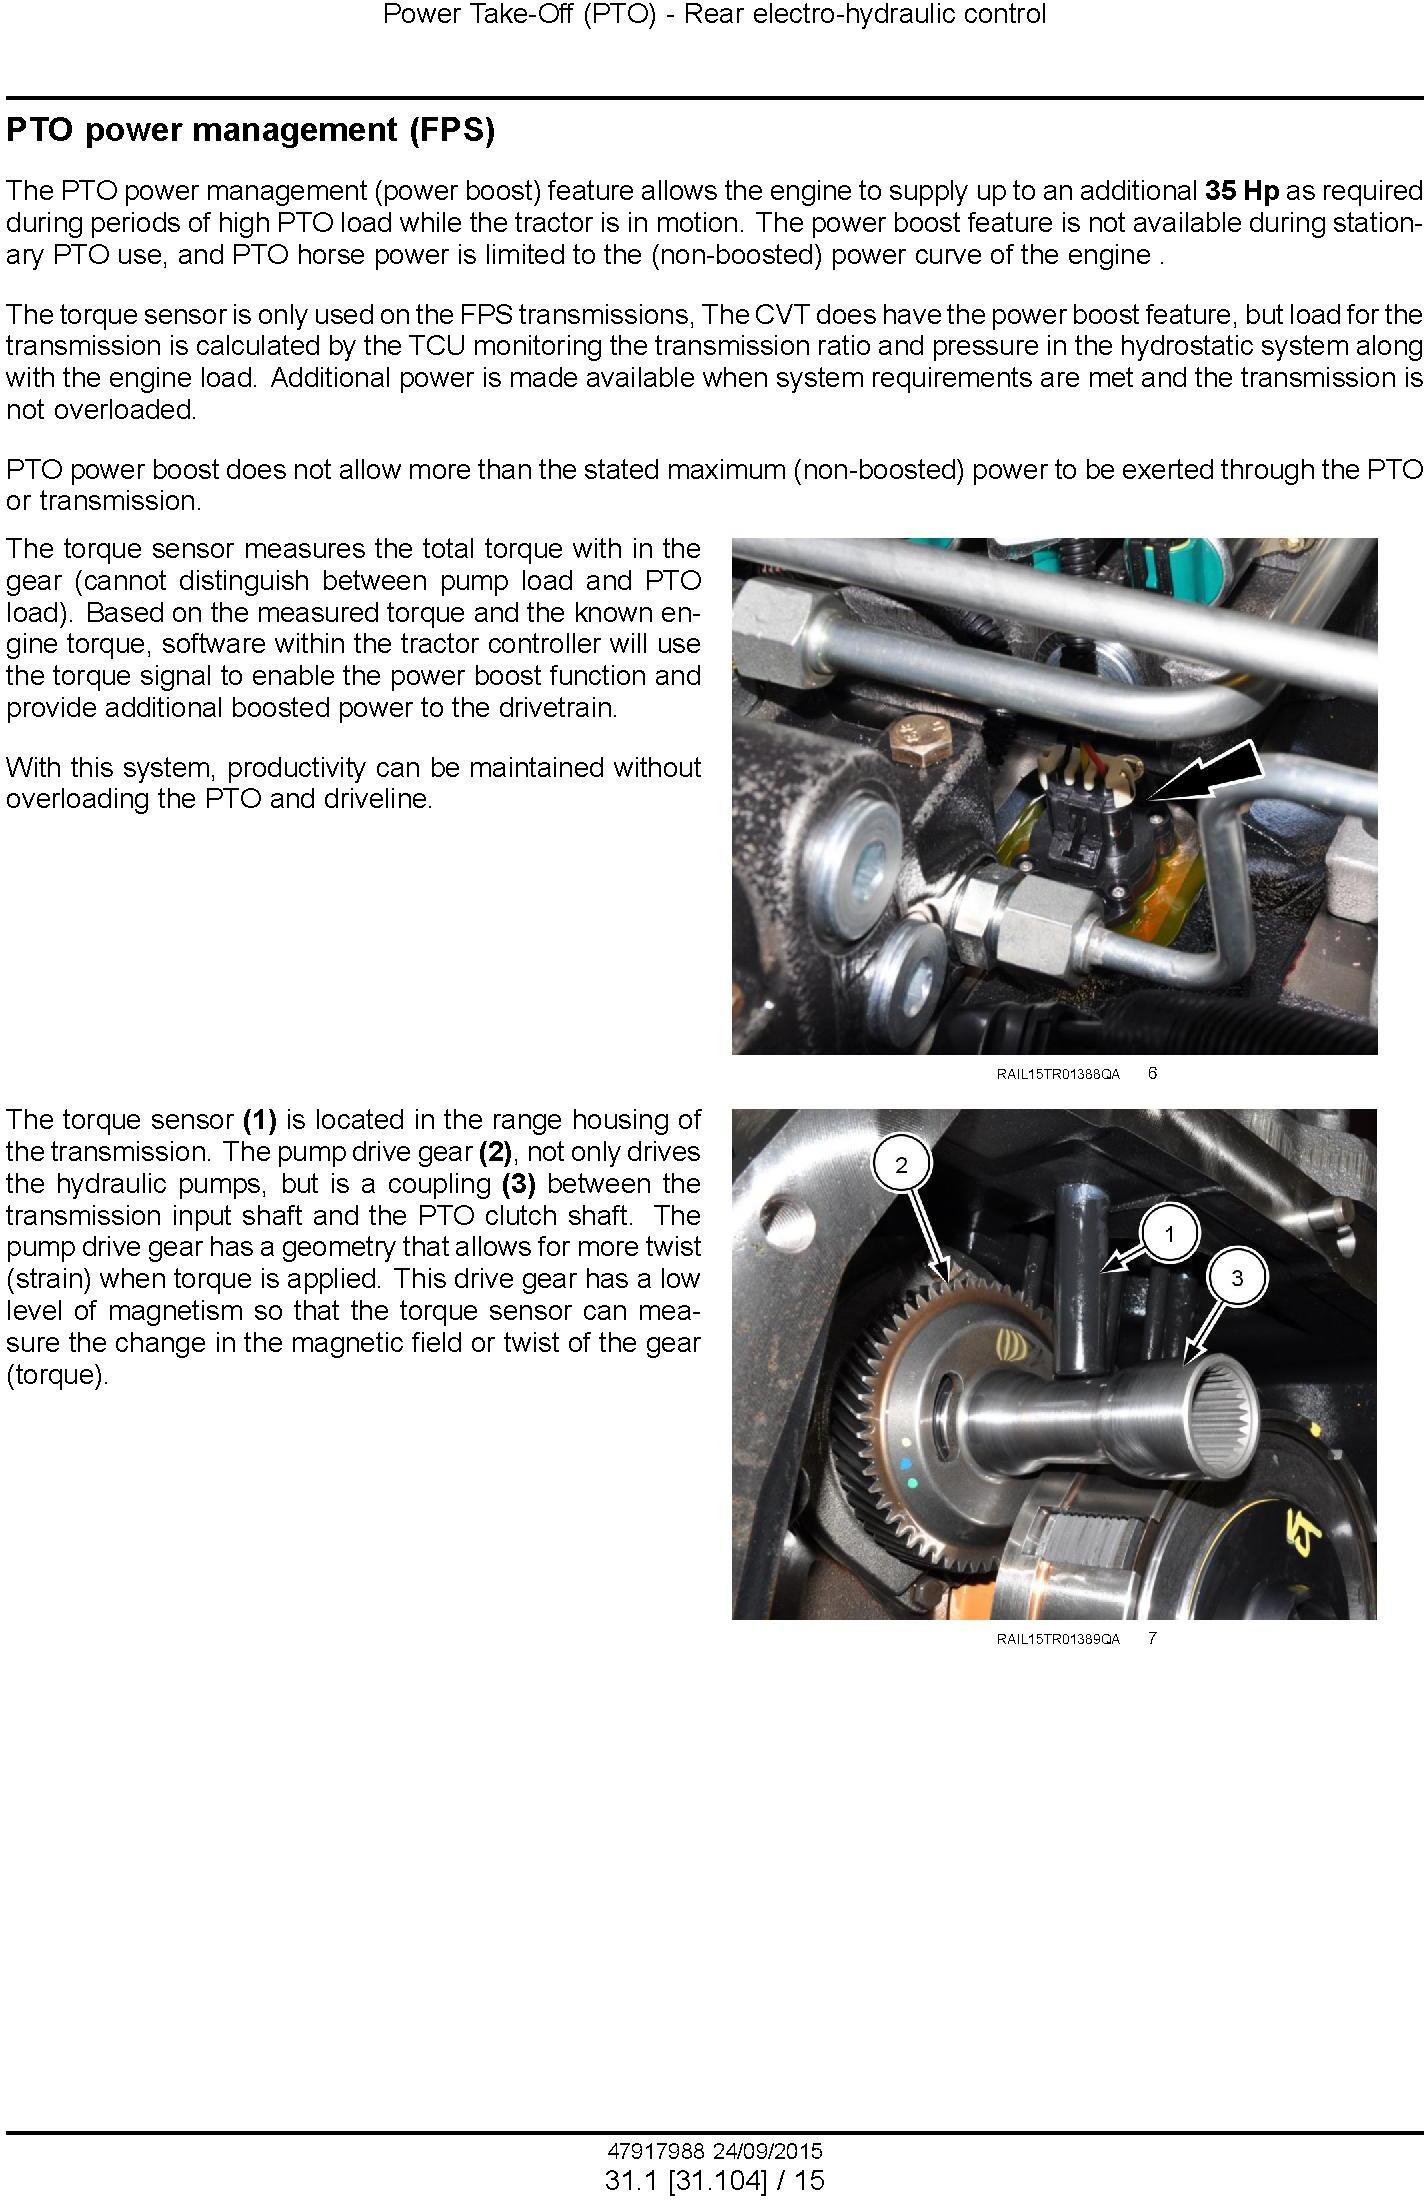 New Holland T8.320, T8.350, T8.380, T8.410, T8.435 and SmartTrax; CVT Tier 4B Tractor service manual - 3